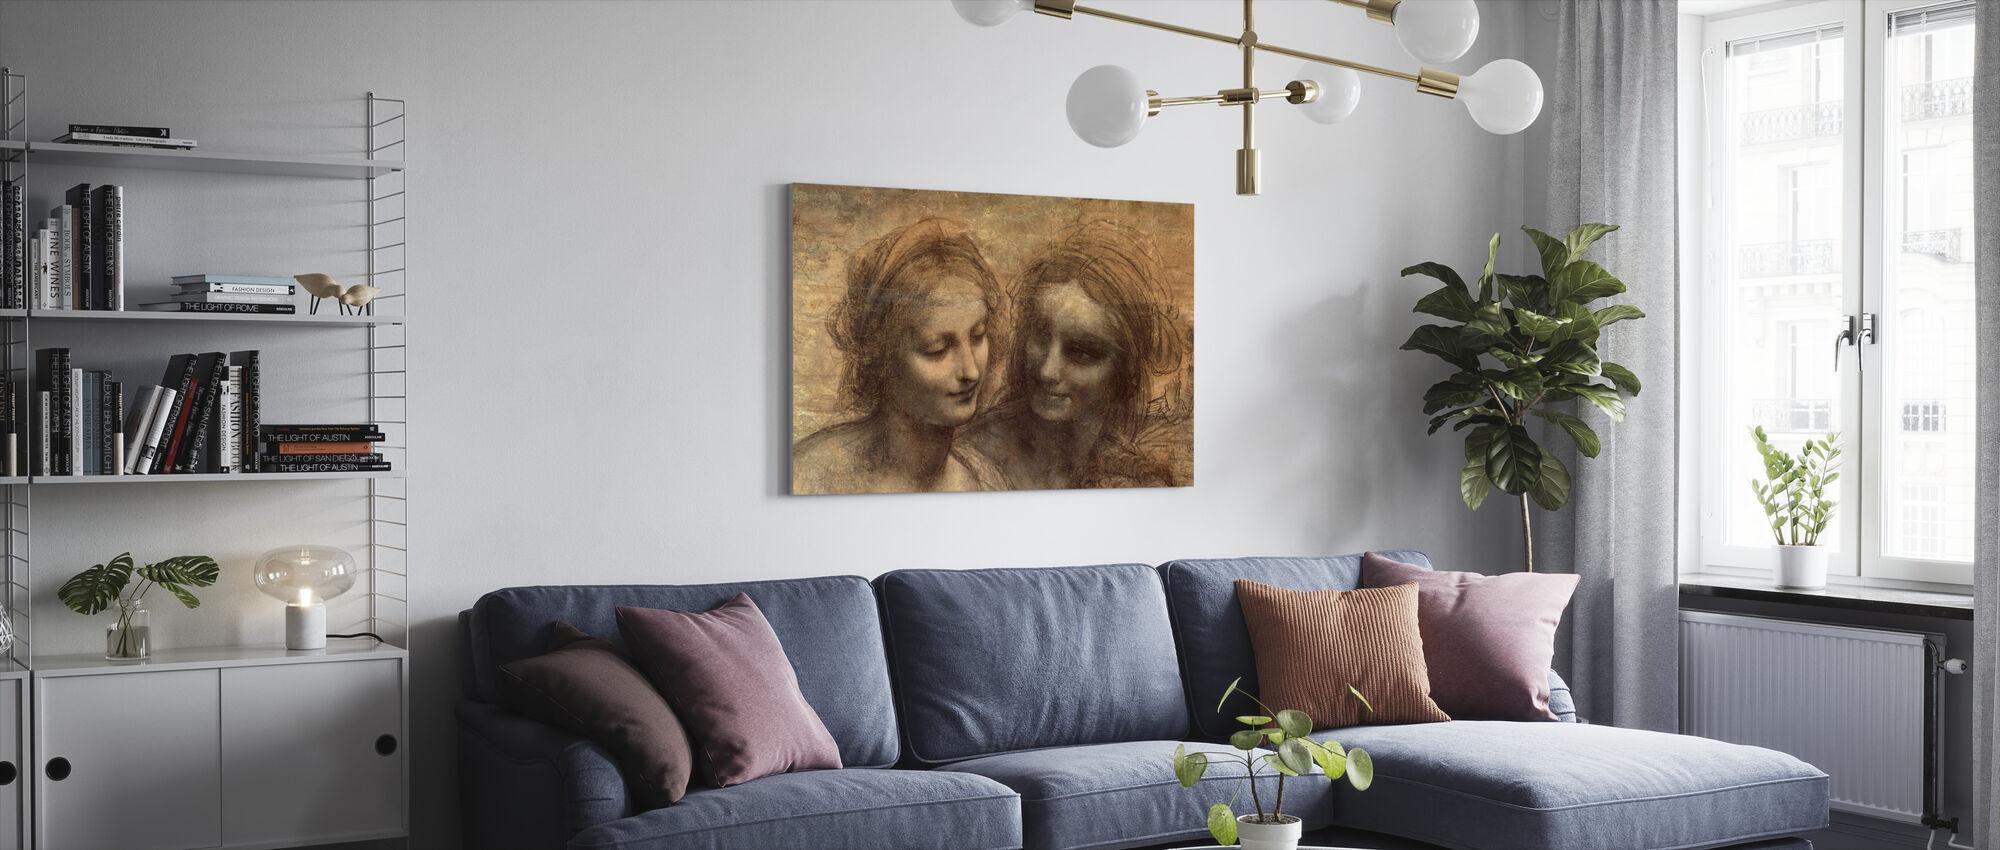 Maagd met Kind - Leonardo da Vinci - Canvas print - Woonkamer